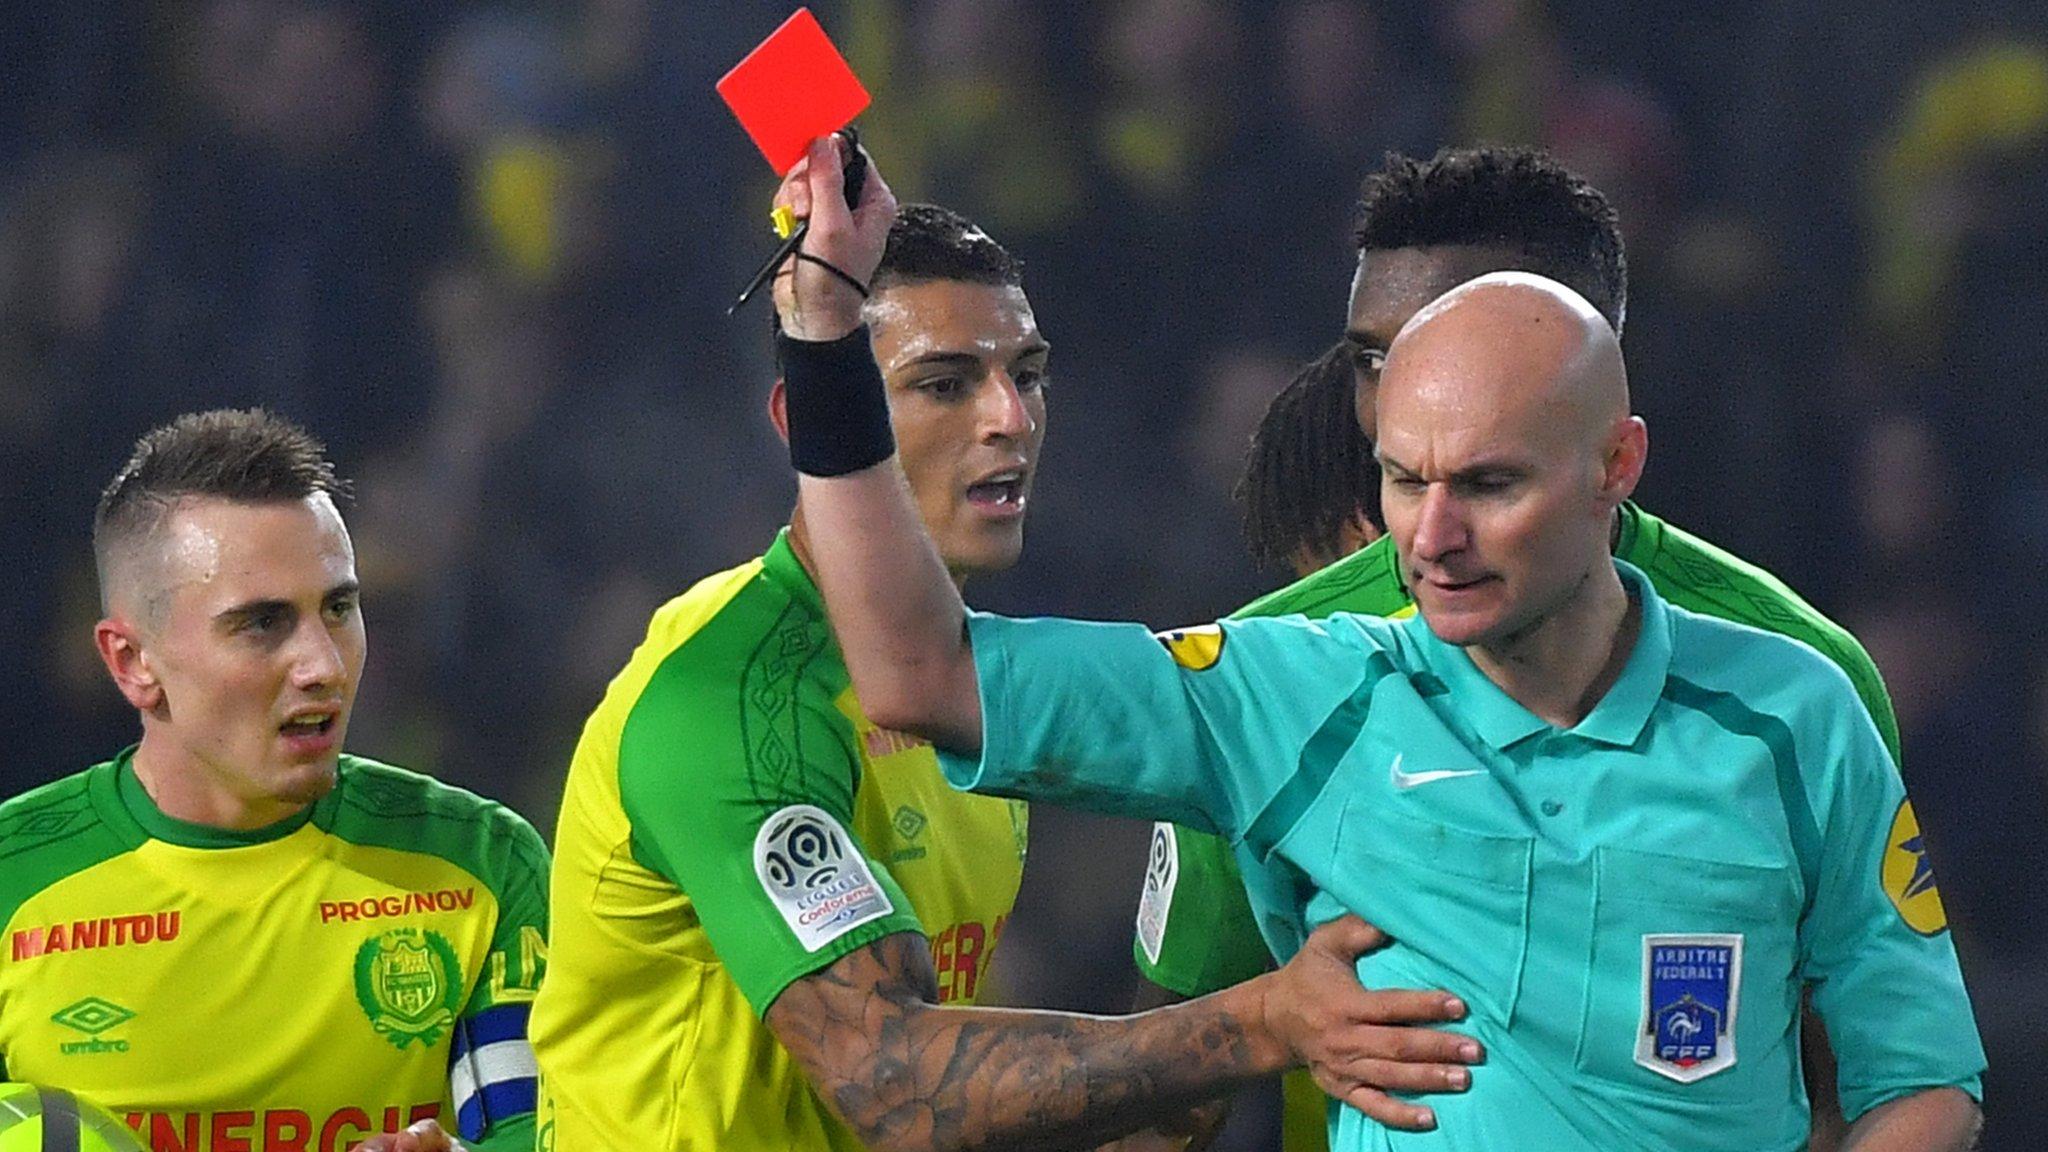 'I reacted badly' - Nantes referee admits kick mistake